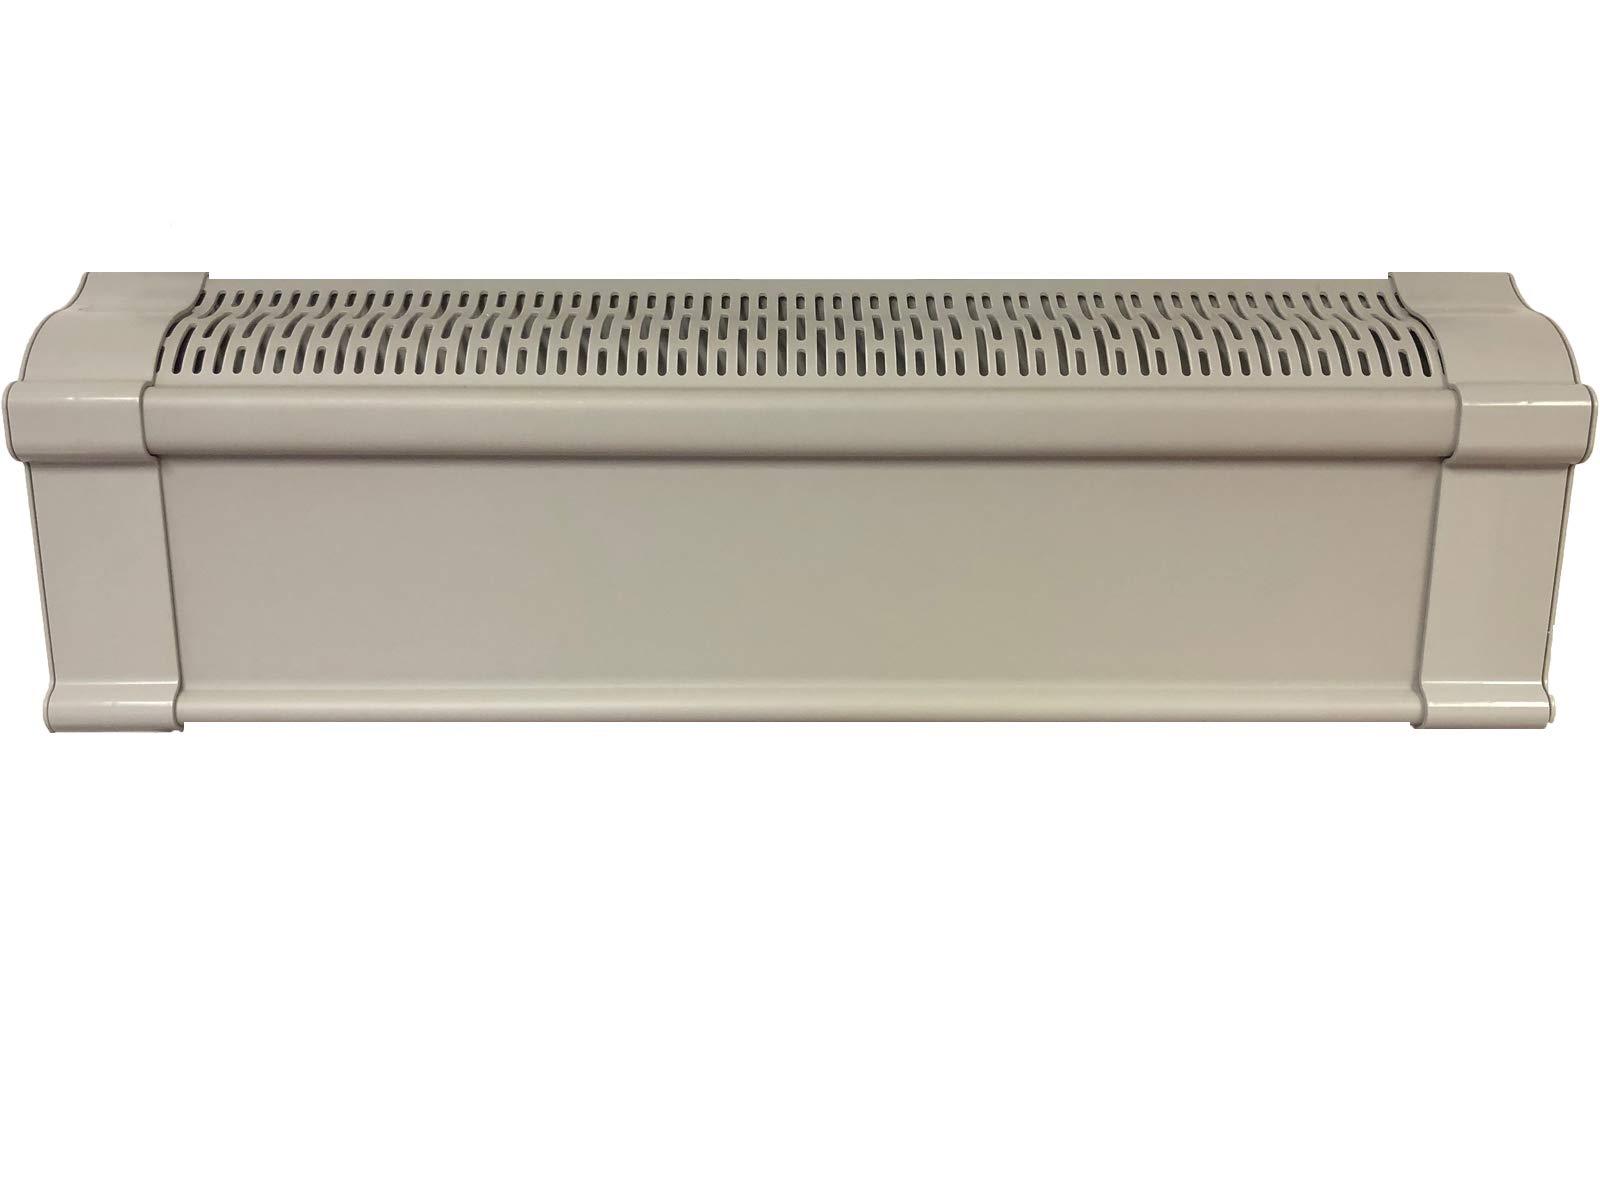 Cheap Baseboard Heat Covers Better Baseboard Heater